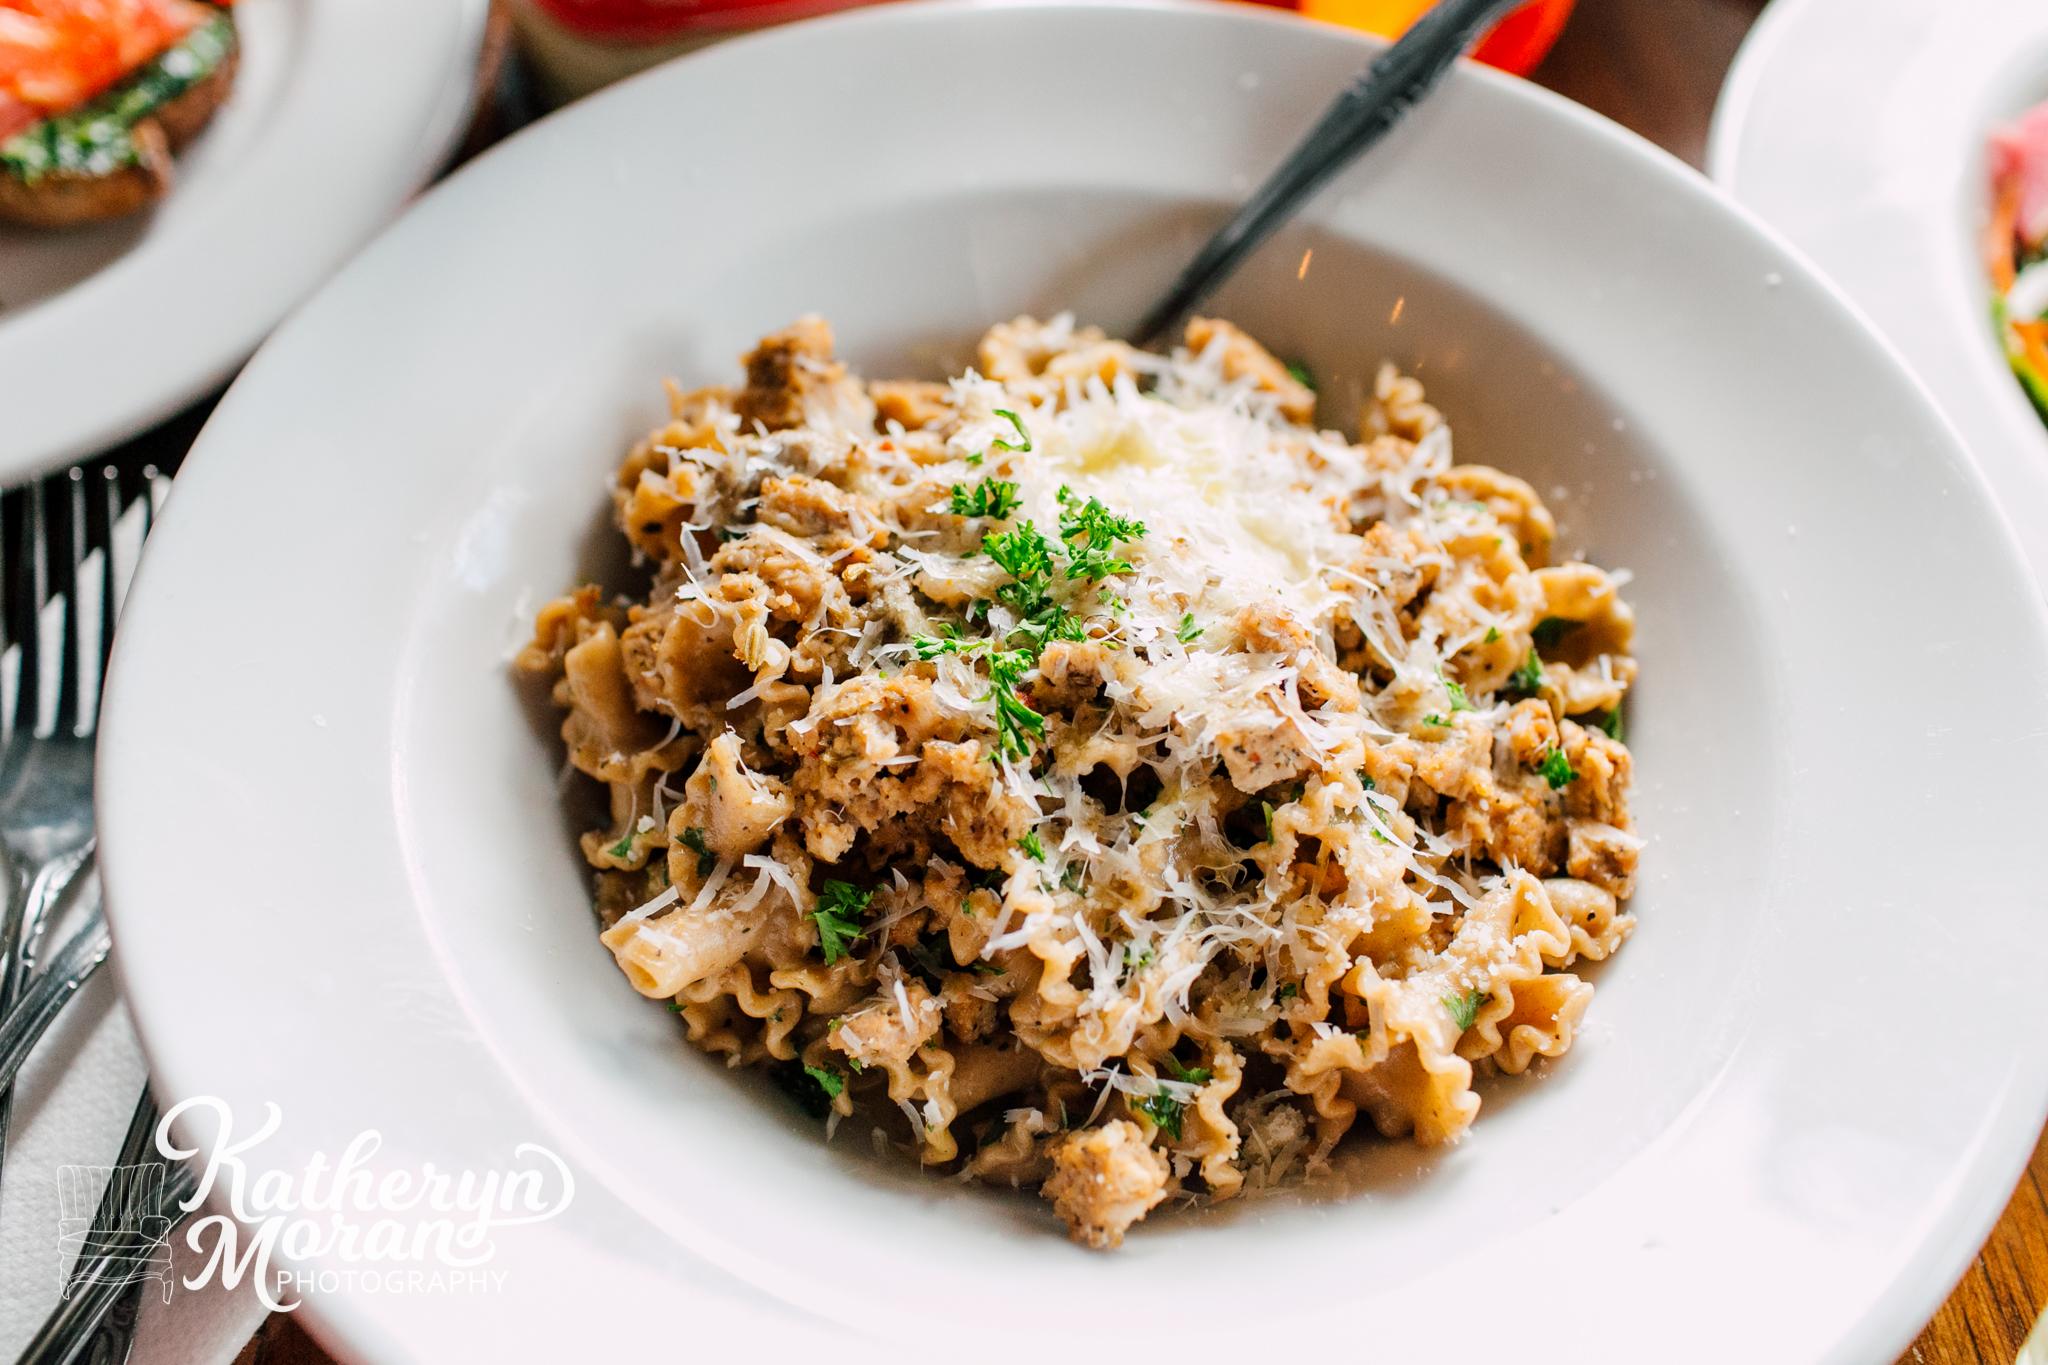 seattle-food-photographer-katheryn-moran-due-cucuina-italiana-2018-19.jpg